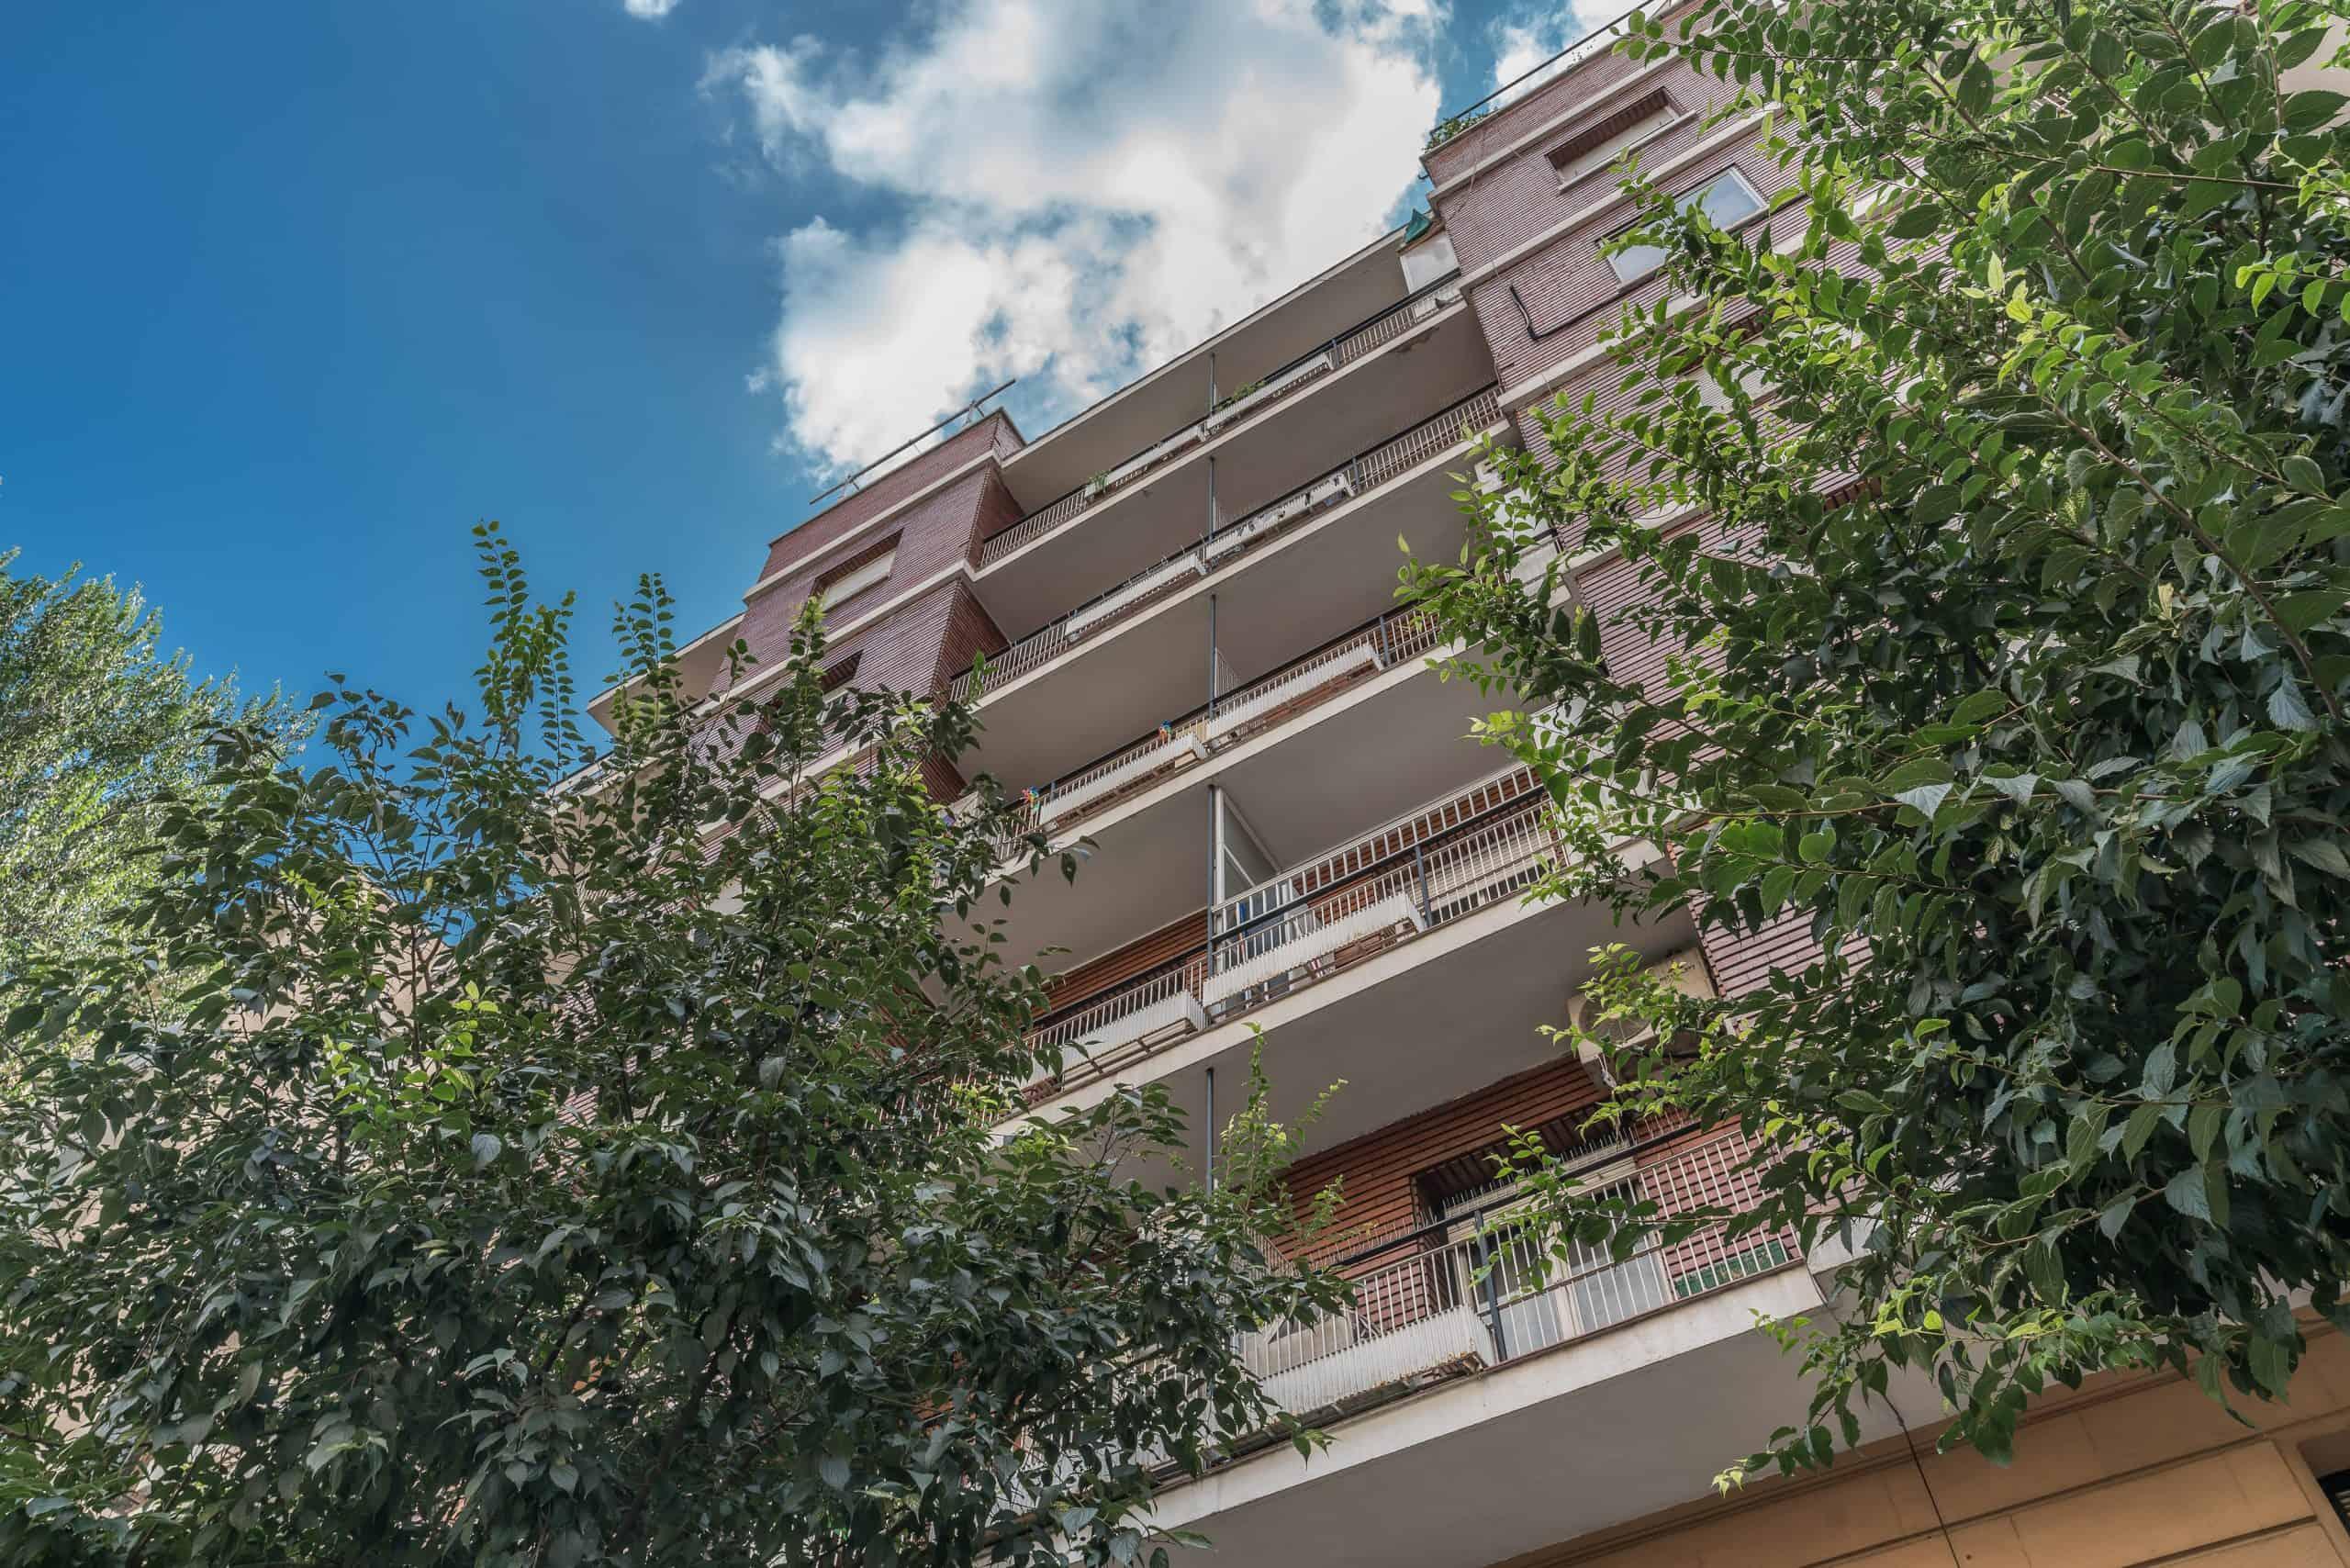 Agencia Inmobiliaria de Madrid-FUTUROCASA-calle Embajadores-Chopera-Arganzuela9 FACHADA (2)